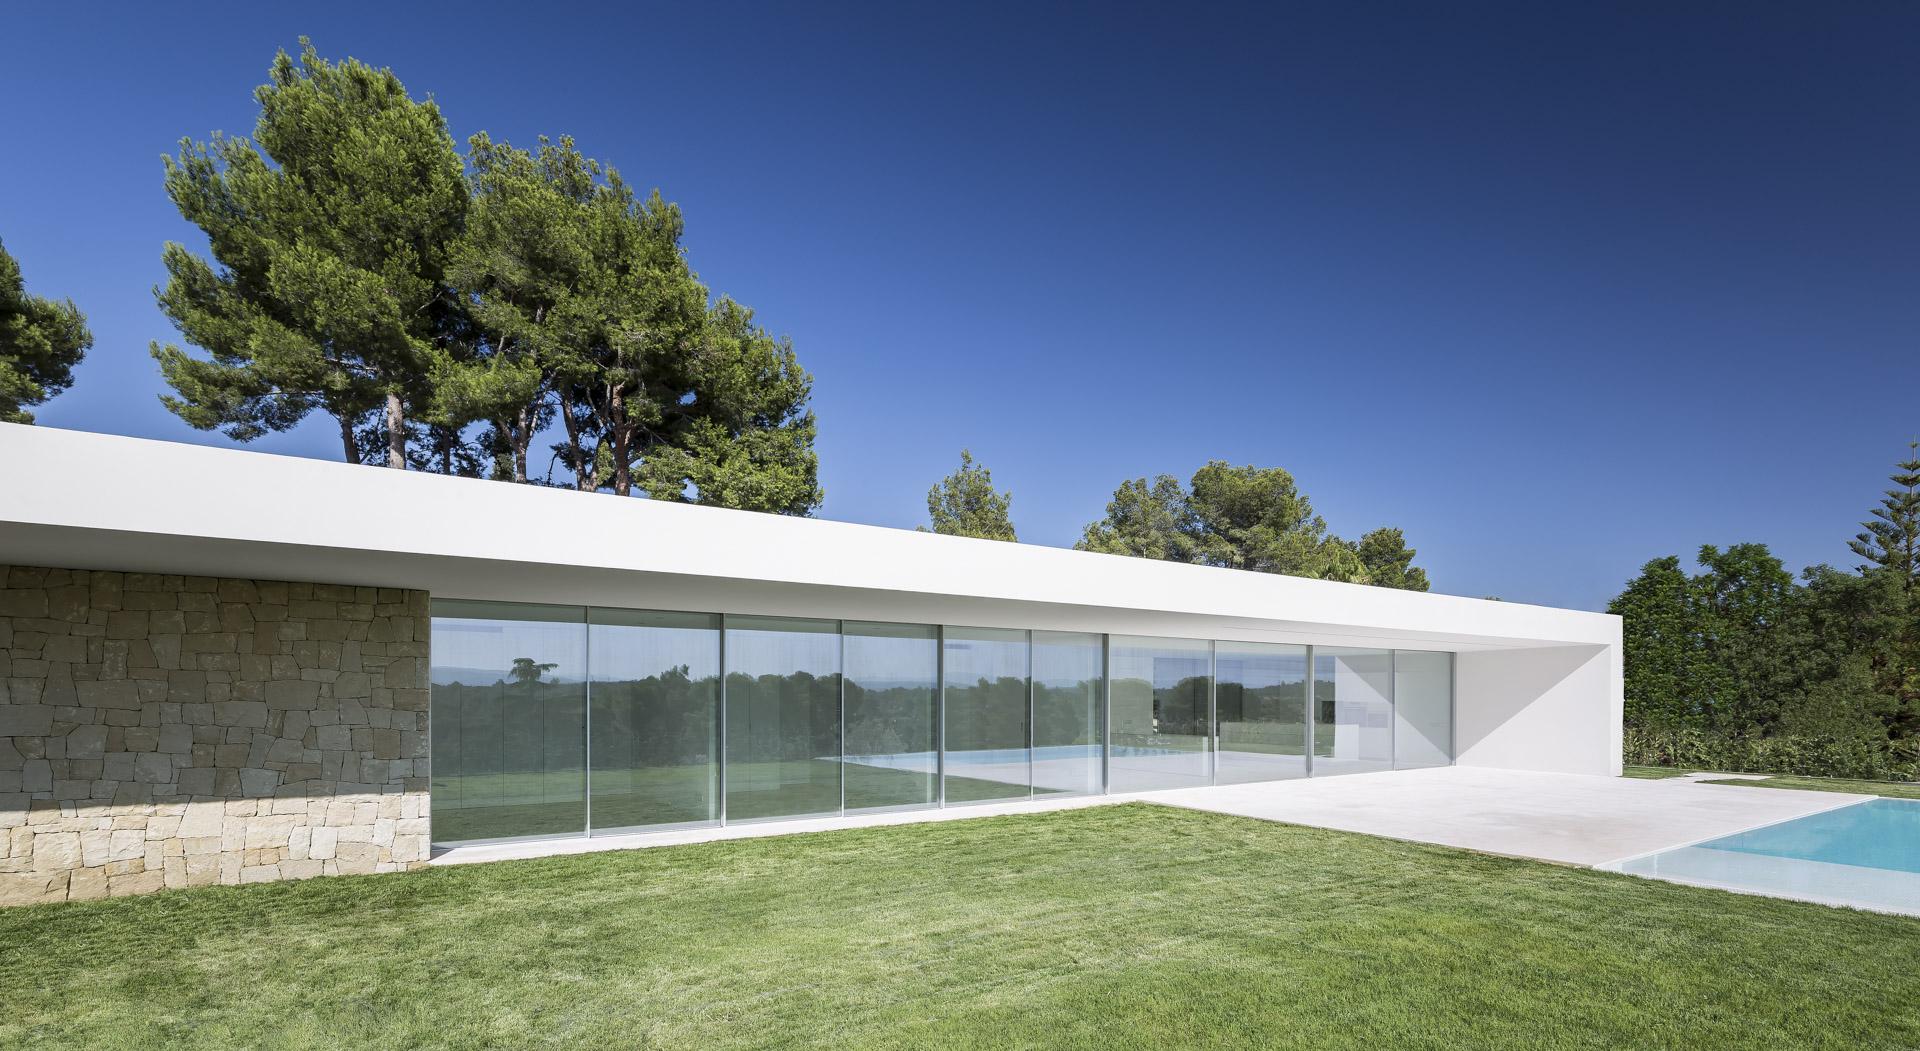 fotografia-arquitectura-valencia-german-cabo-gallardo-llopis-villamarchante-vivienda-15